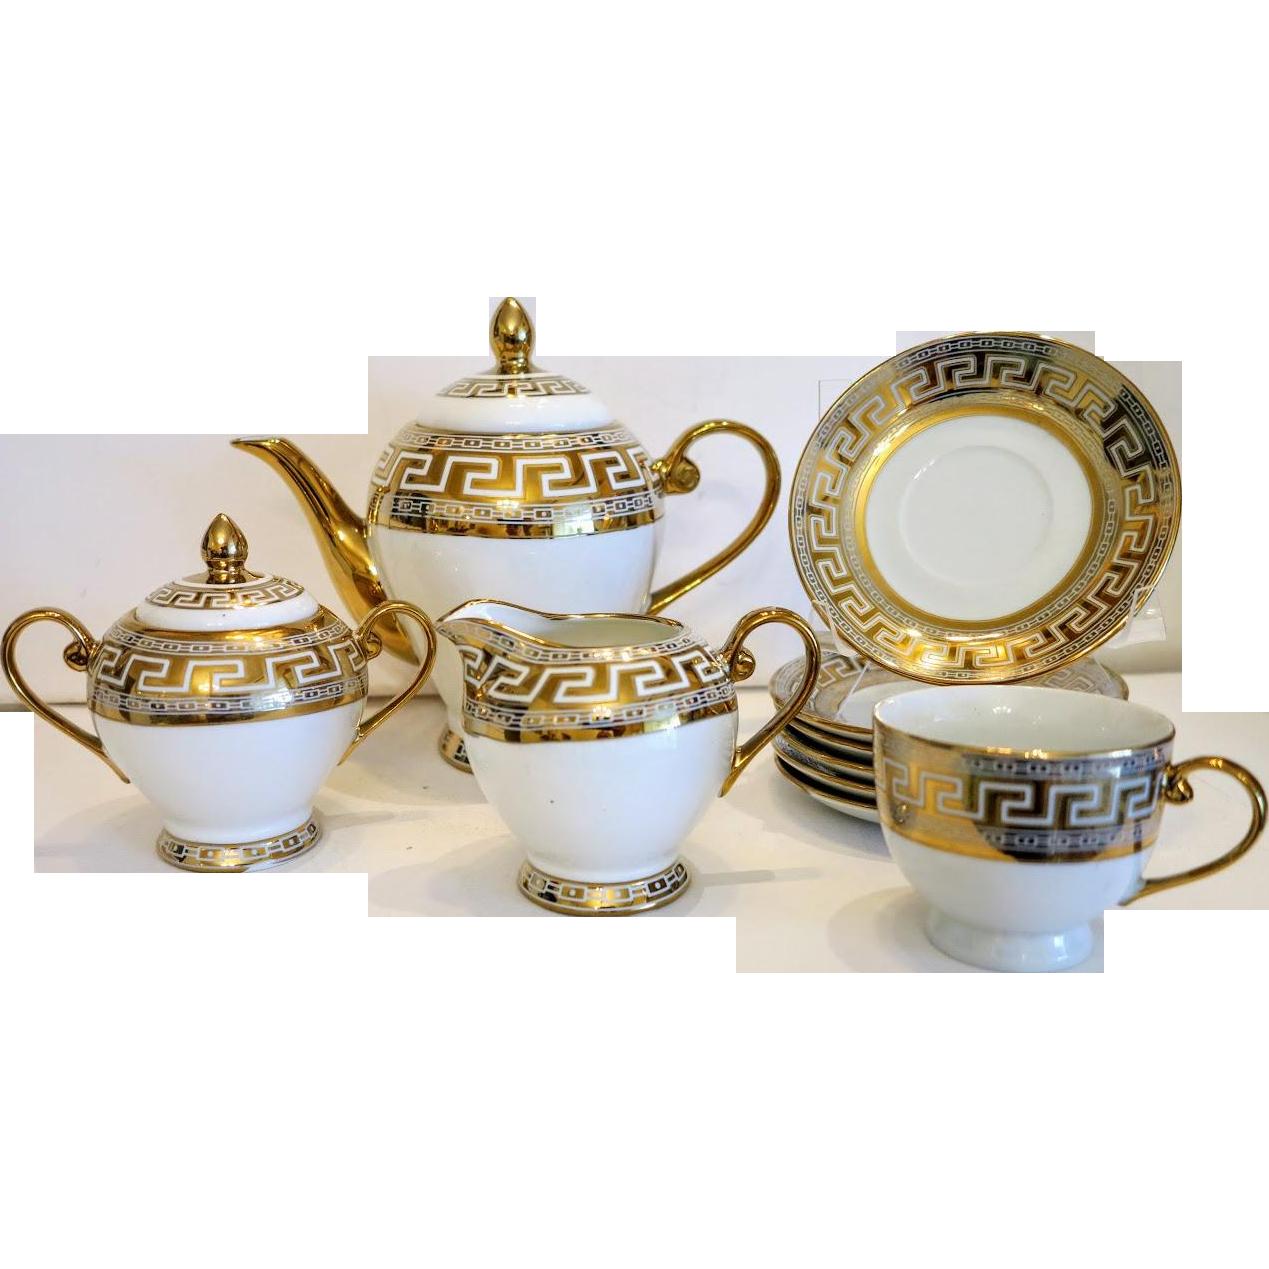 Russian Porcelain Tea Set For Four Ca 1950 Mid 20th Century Porcelain Teapot Sugar Creamer Cups Saucers In White An Porcelain Tea Set Tea Set Porcelain